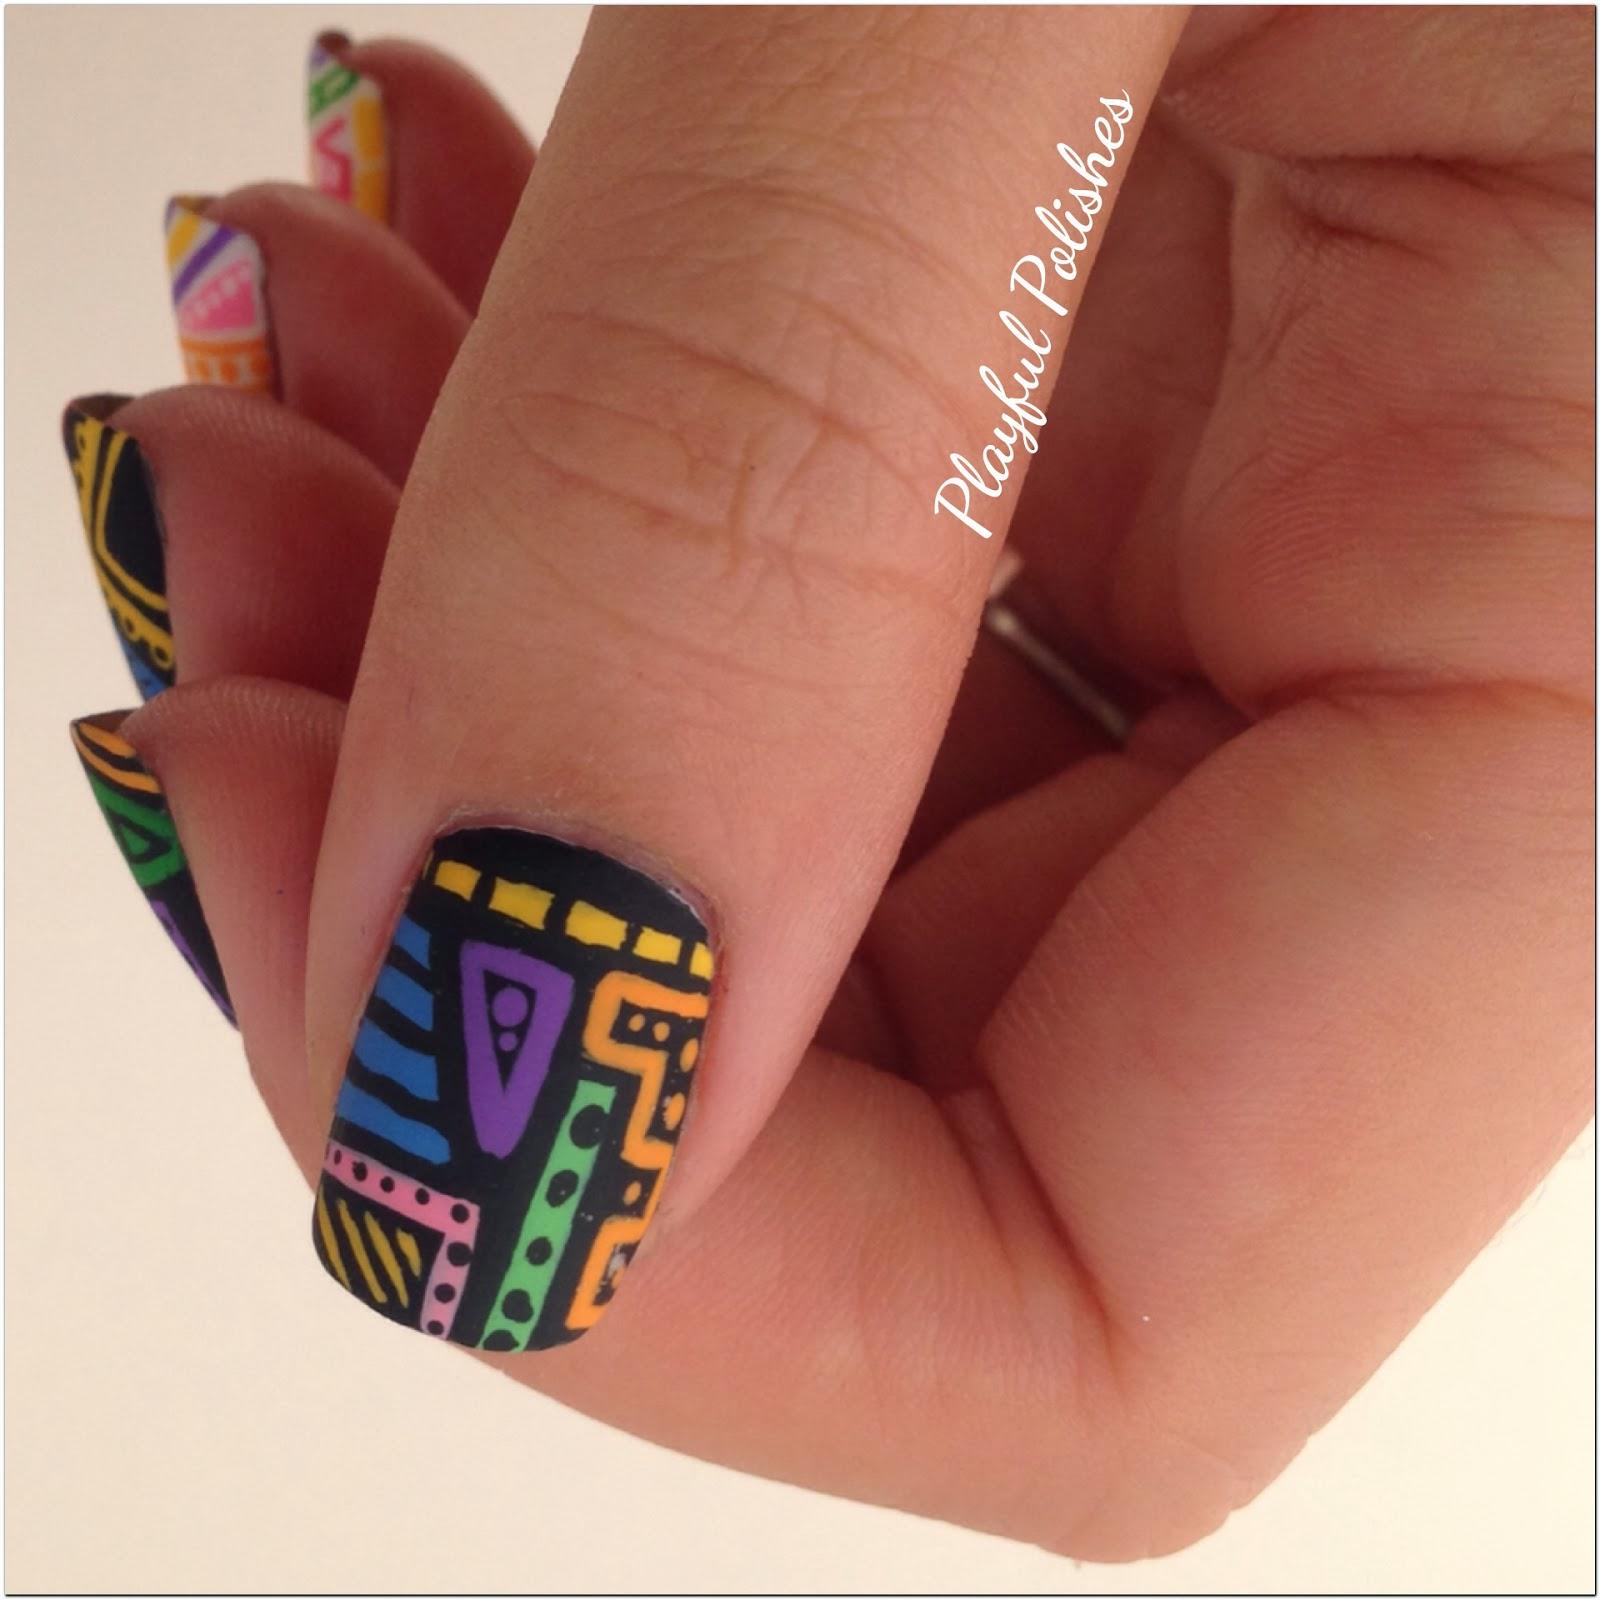 Playful Polishes June Nail Art Challenge Ocean Nails: Playful Polishes: 31 DAY NAIL ART CHALLENGE: TRIBAL NAILS